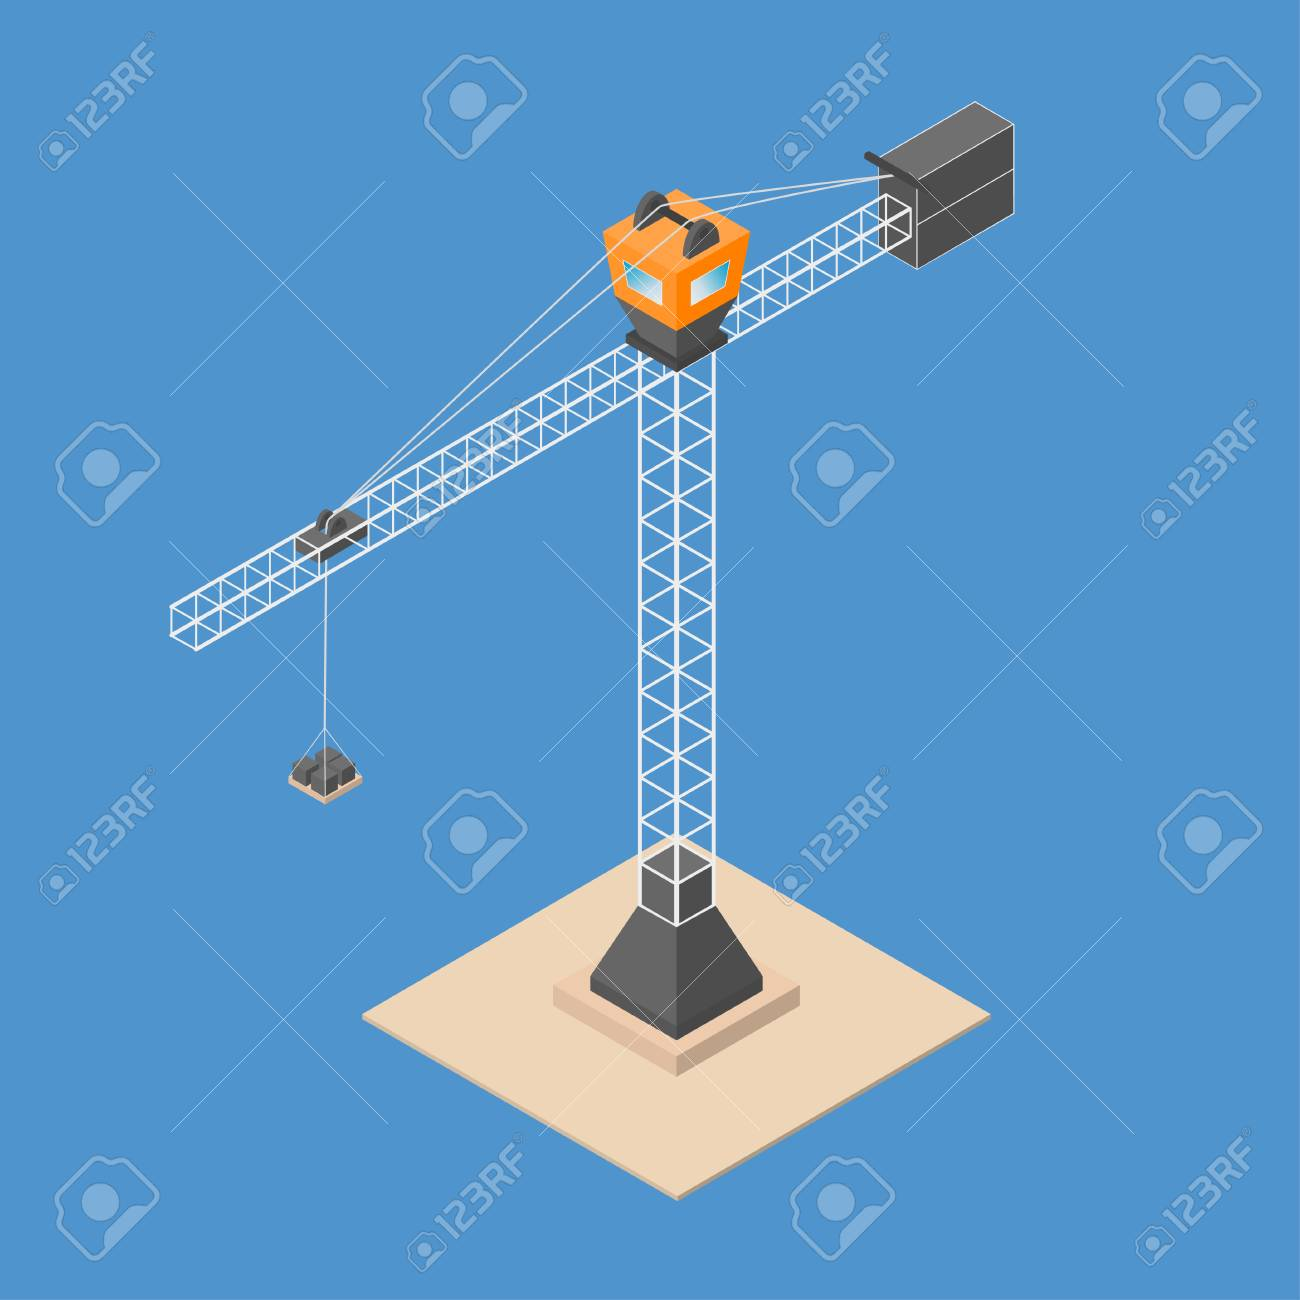 Industrial construction crane. Isometric crane with bricks, standing on sand. Vector - 79509054